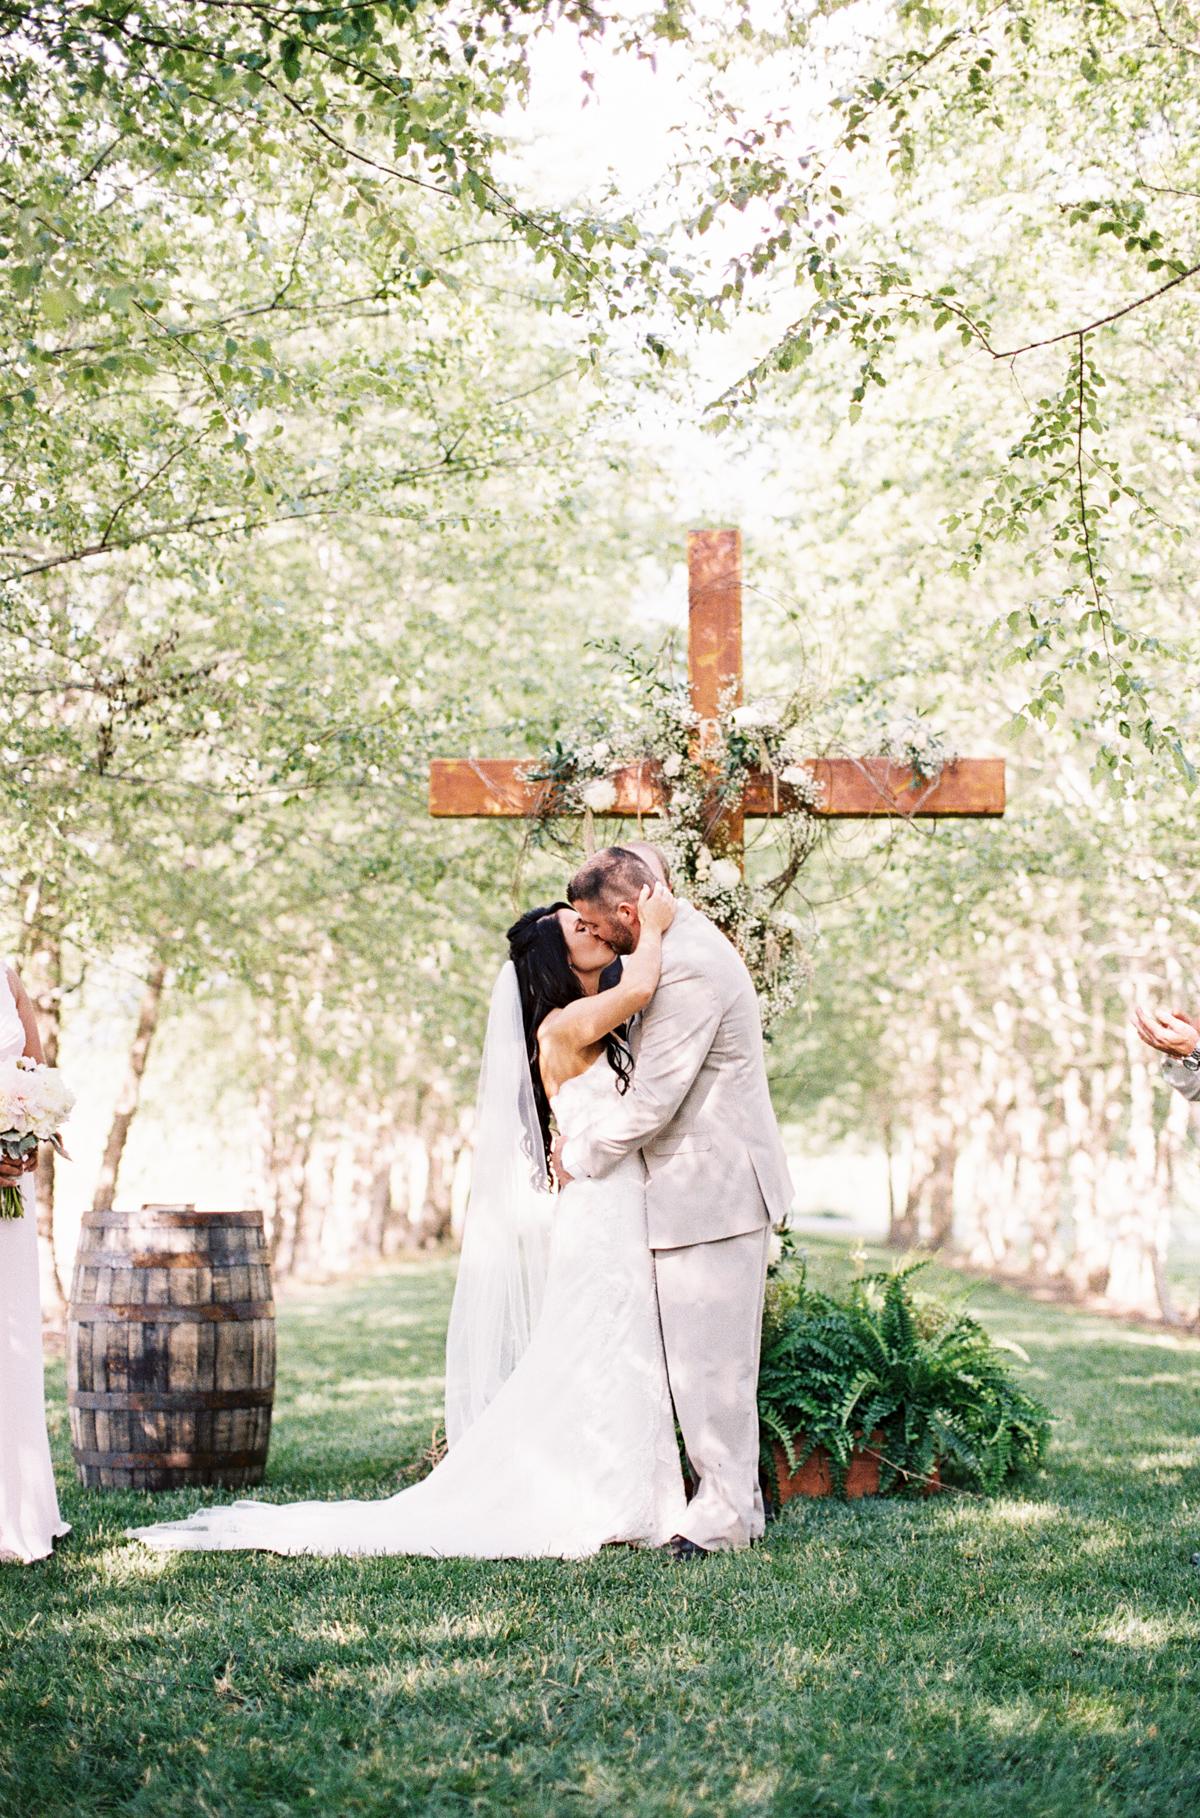 mcguires-millrace-farm-wedding-031.jpg